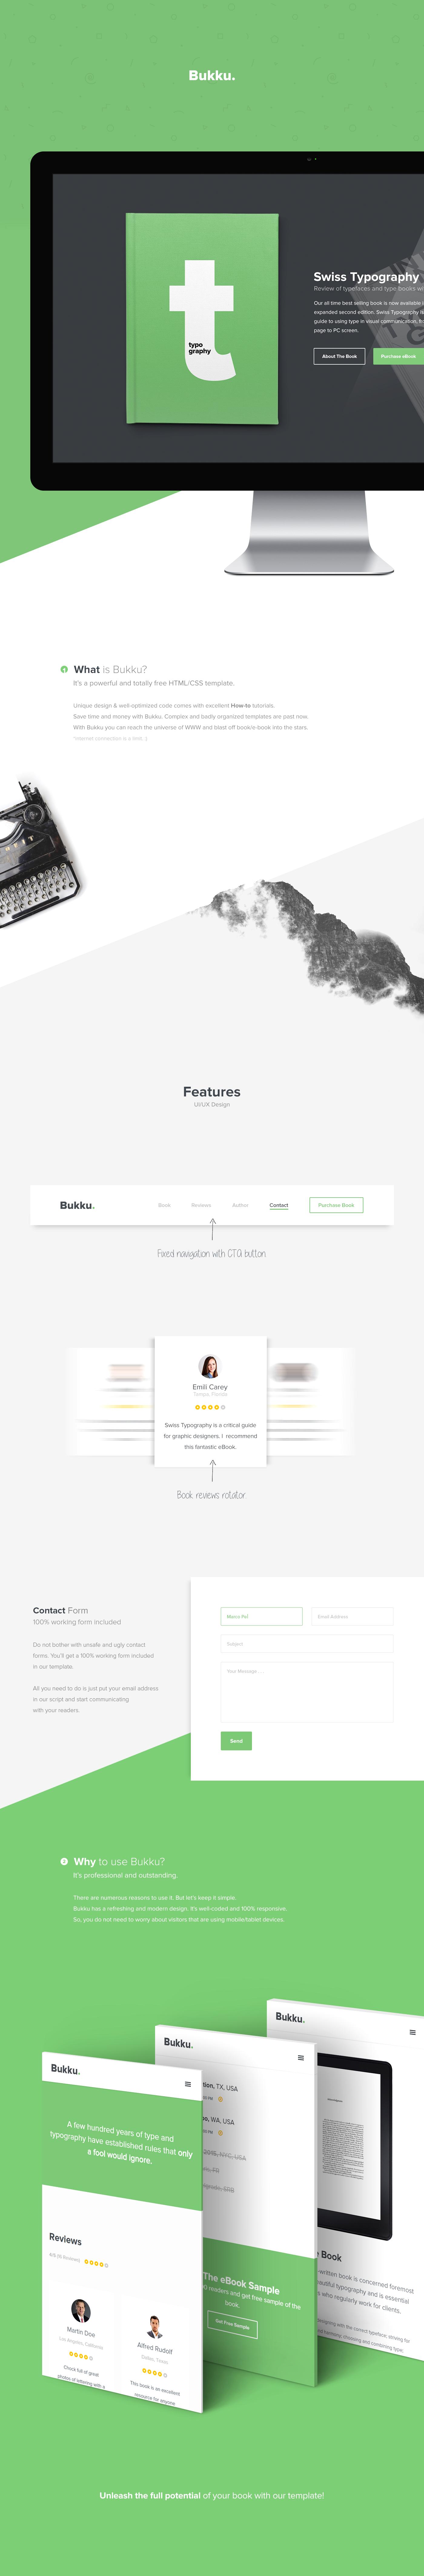 HTML css template free book ebook publishing   modern Responsive clean minimalistic creative agency freebie